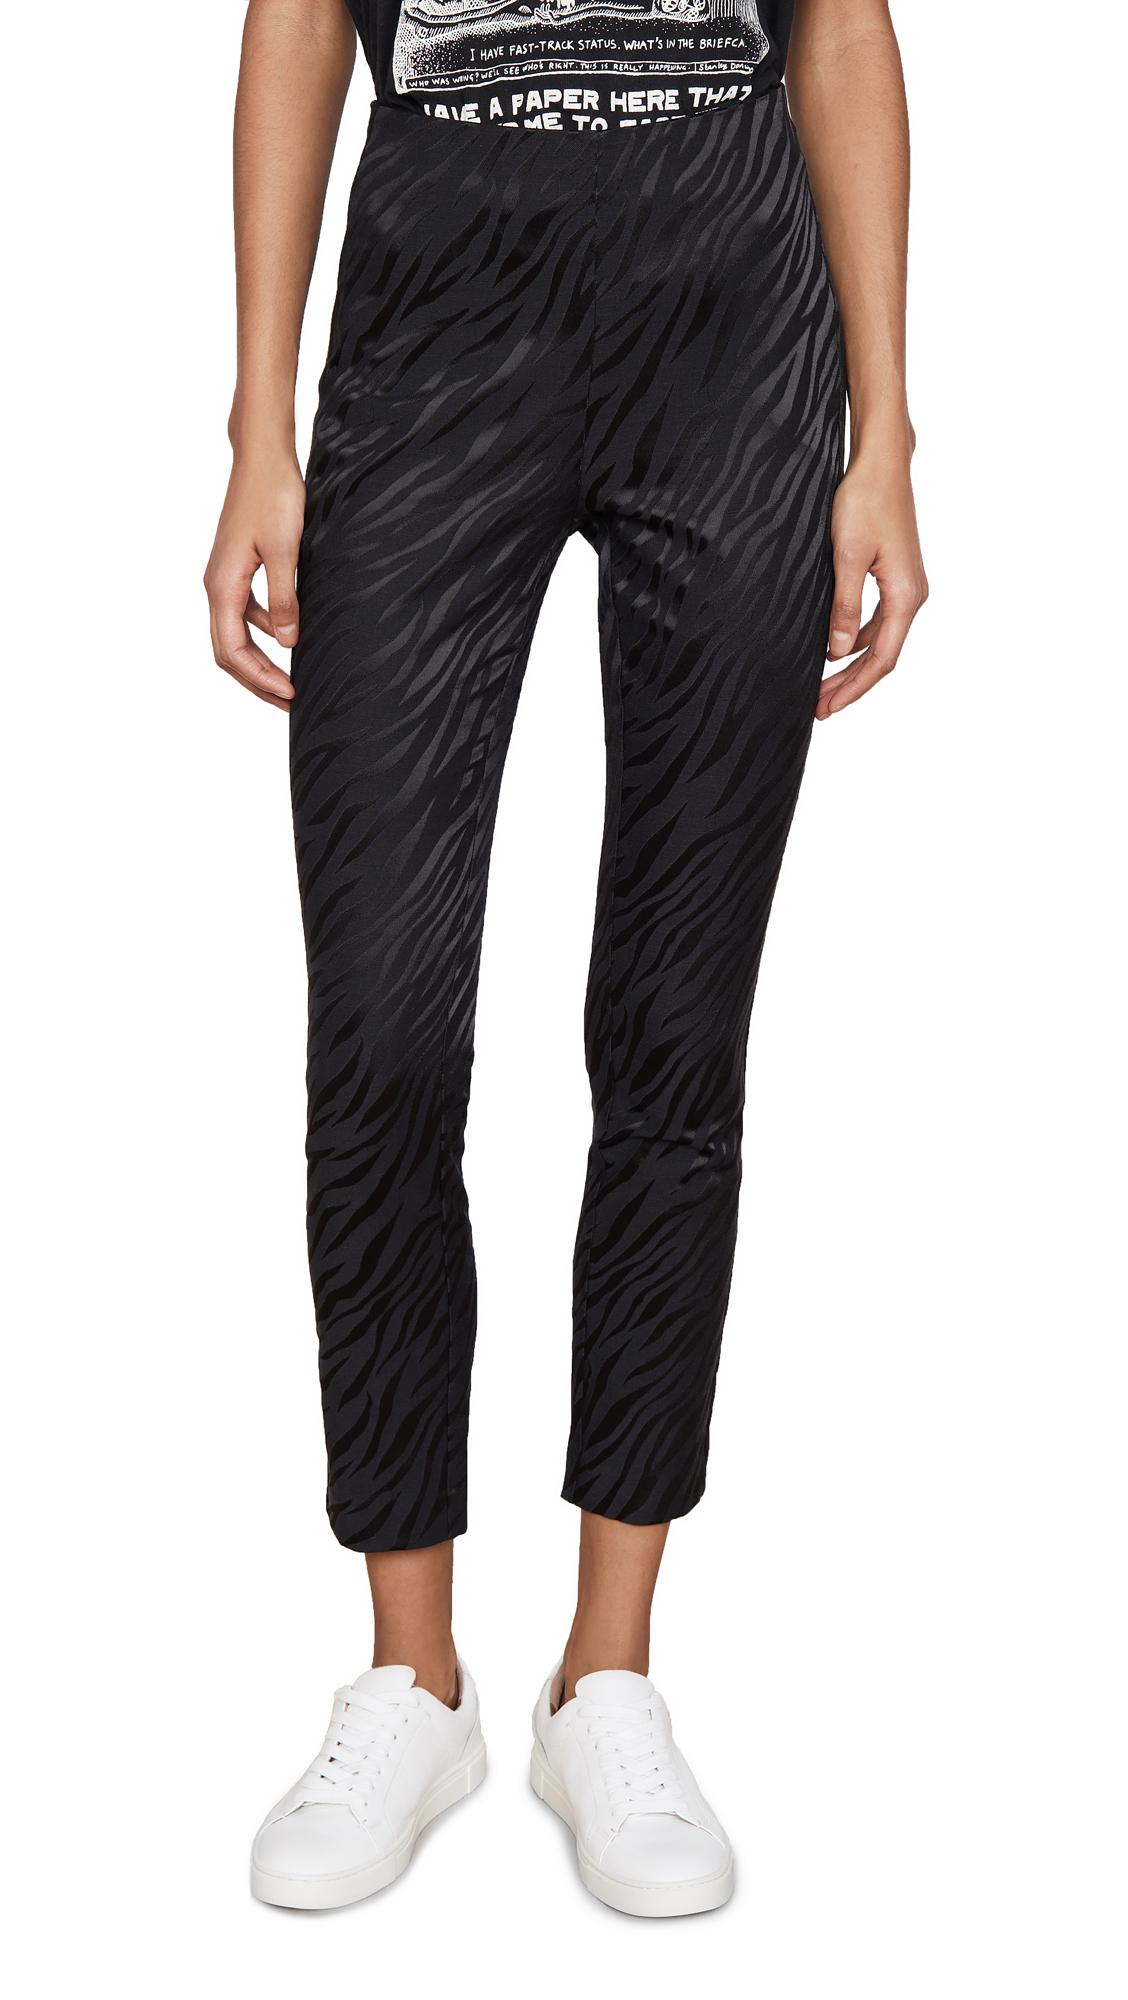 Rag & Bone Simone Zebra Print Cropped Pants In Black